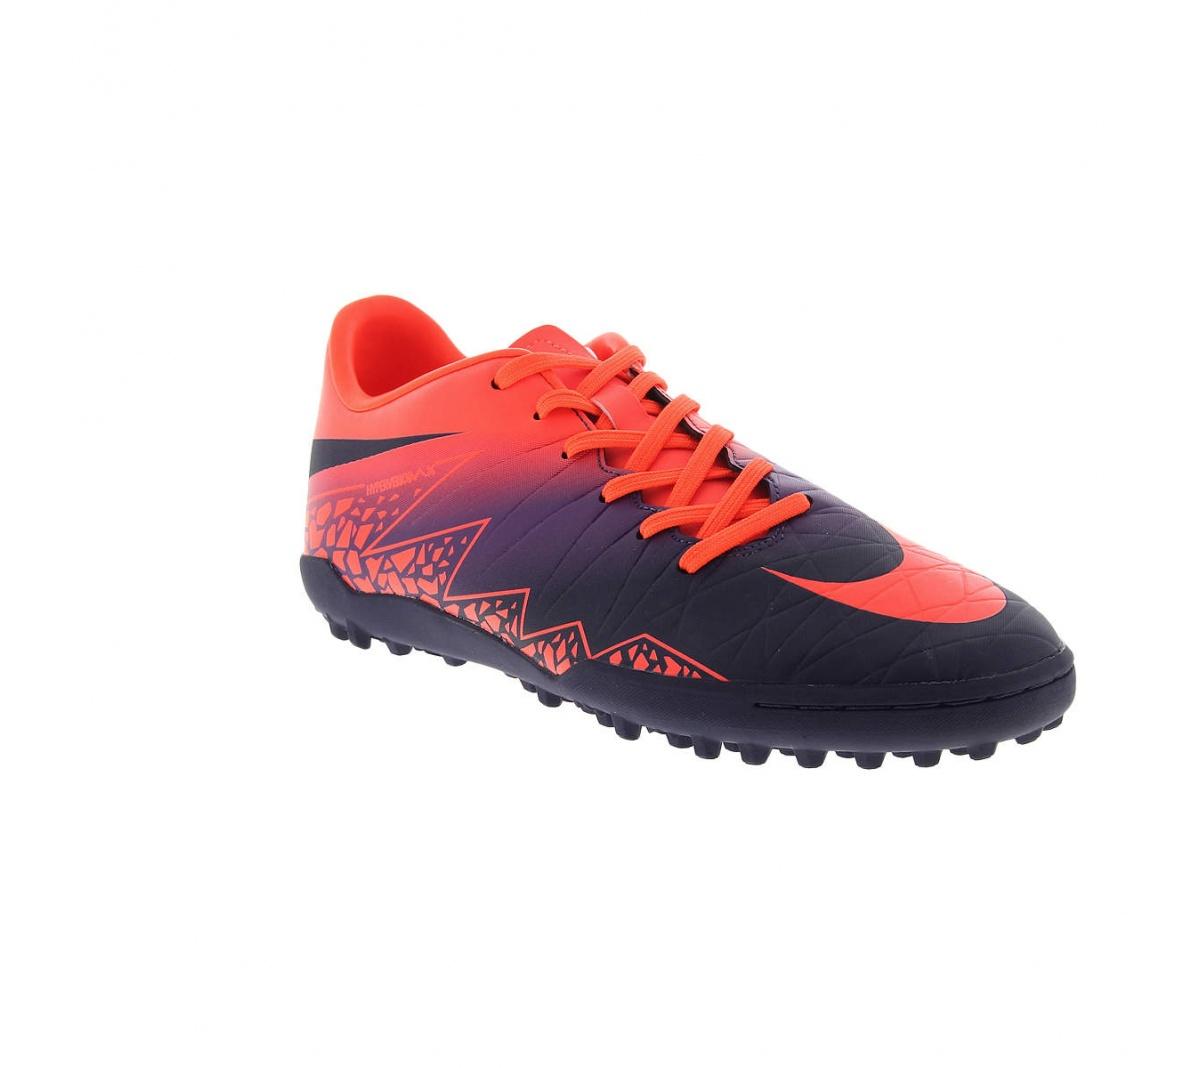 9220500e7a973 Chuteira Nike Hypervenom Phelon II TF Roxo com Laranja - Mundo do ...